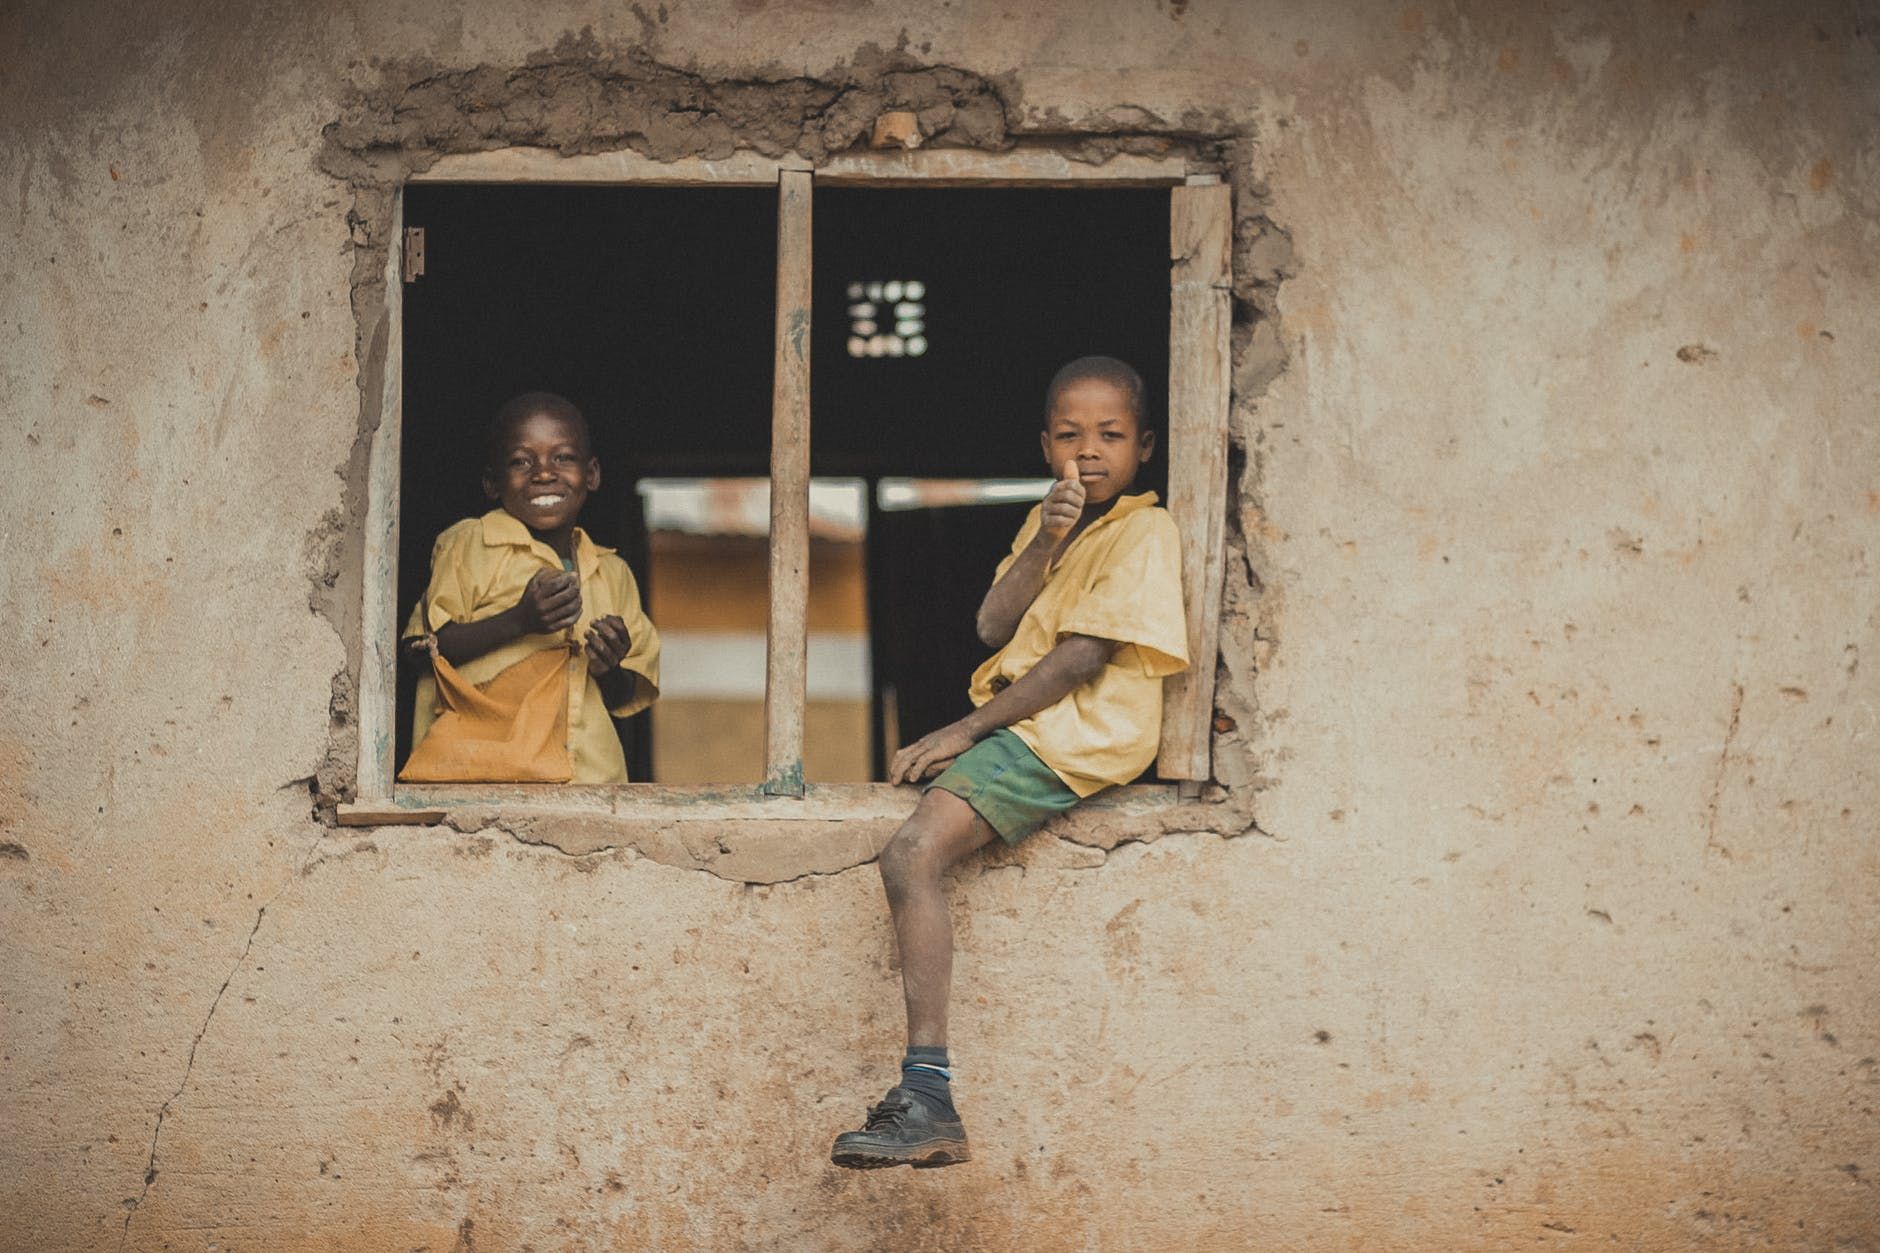 boys in school uniform sitting on window frame of an unfinished classroom